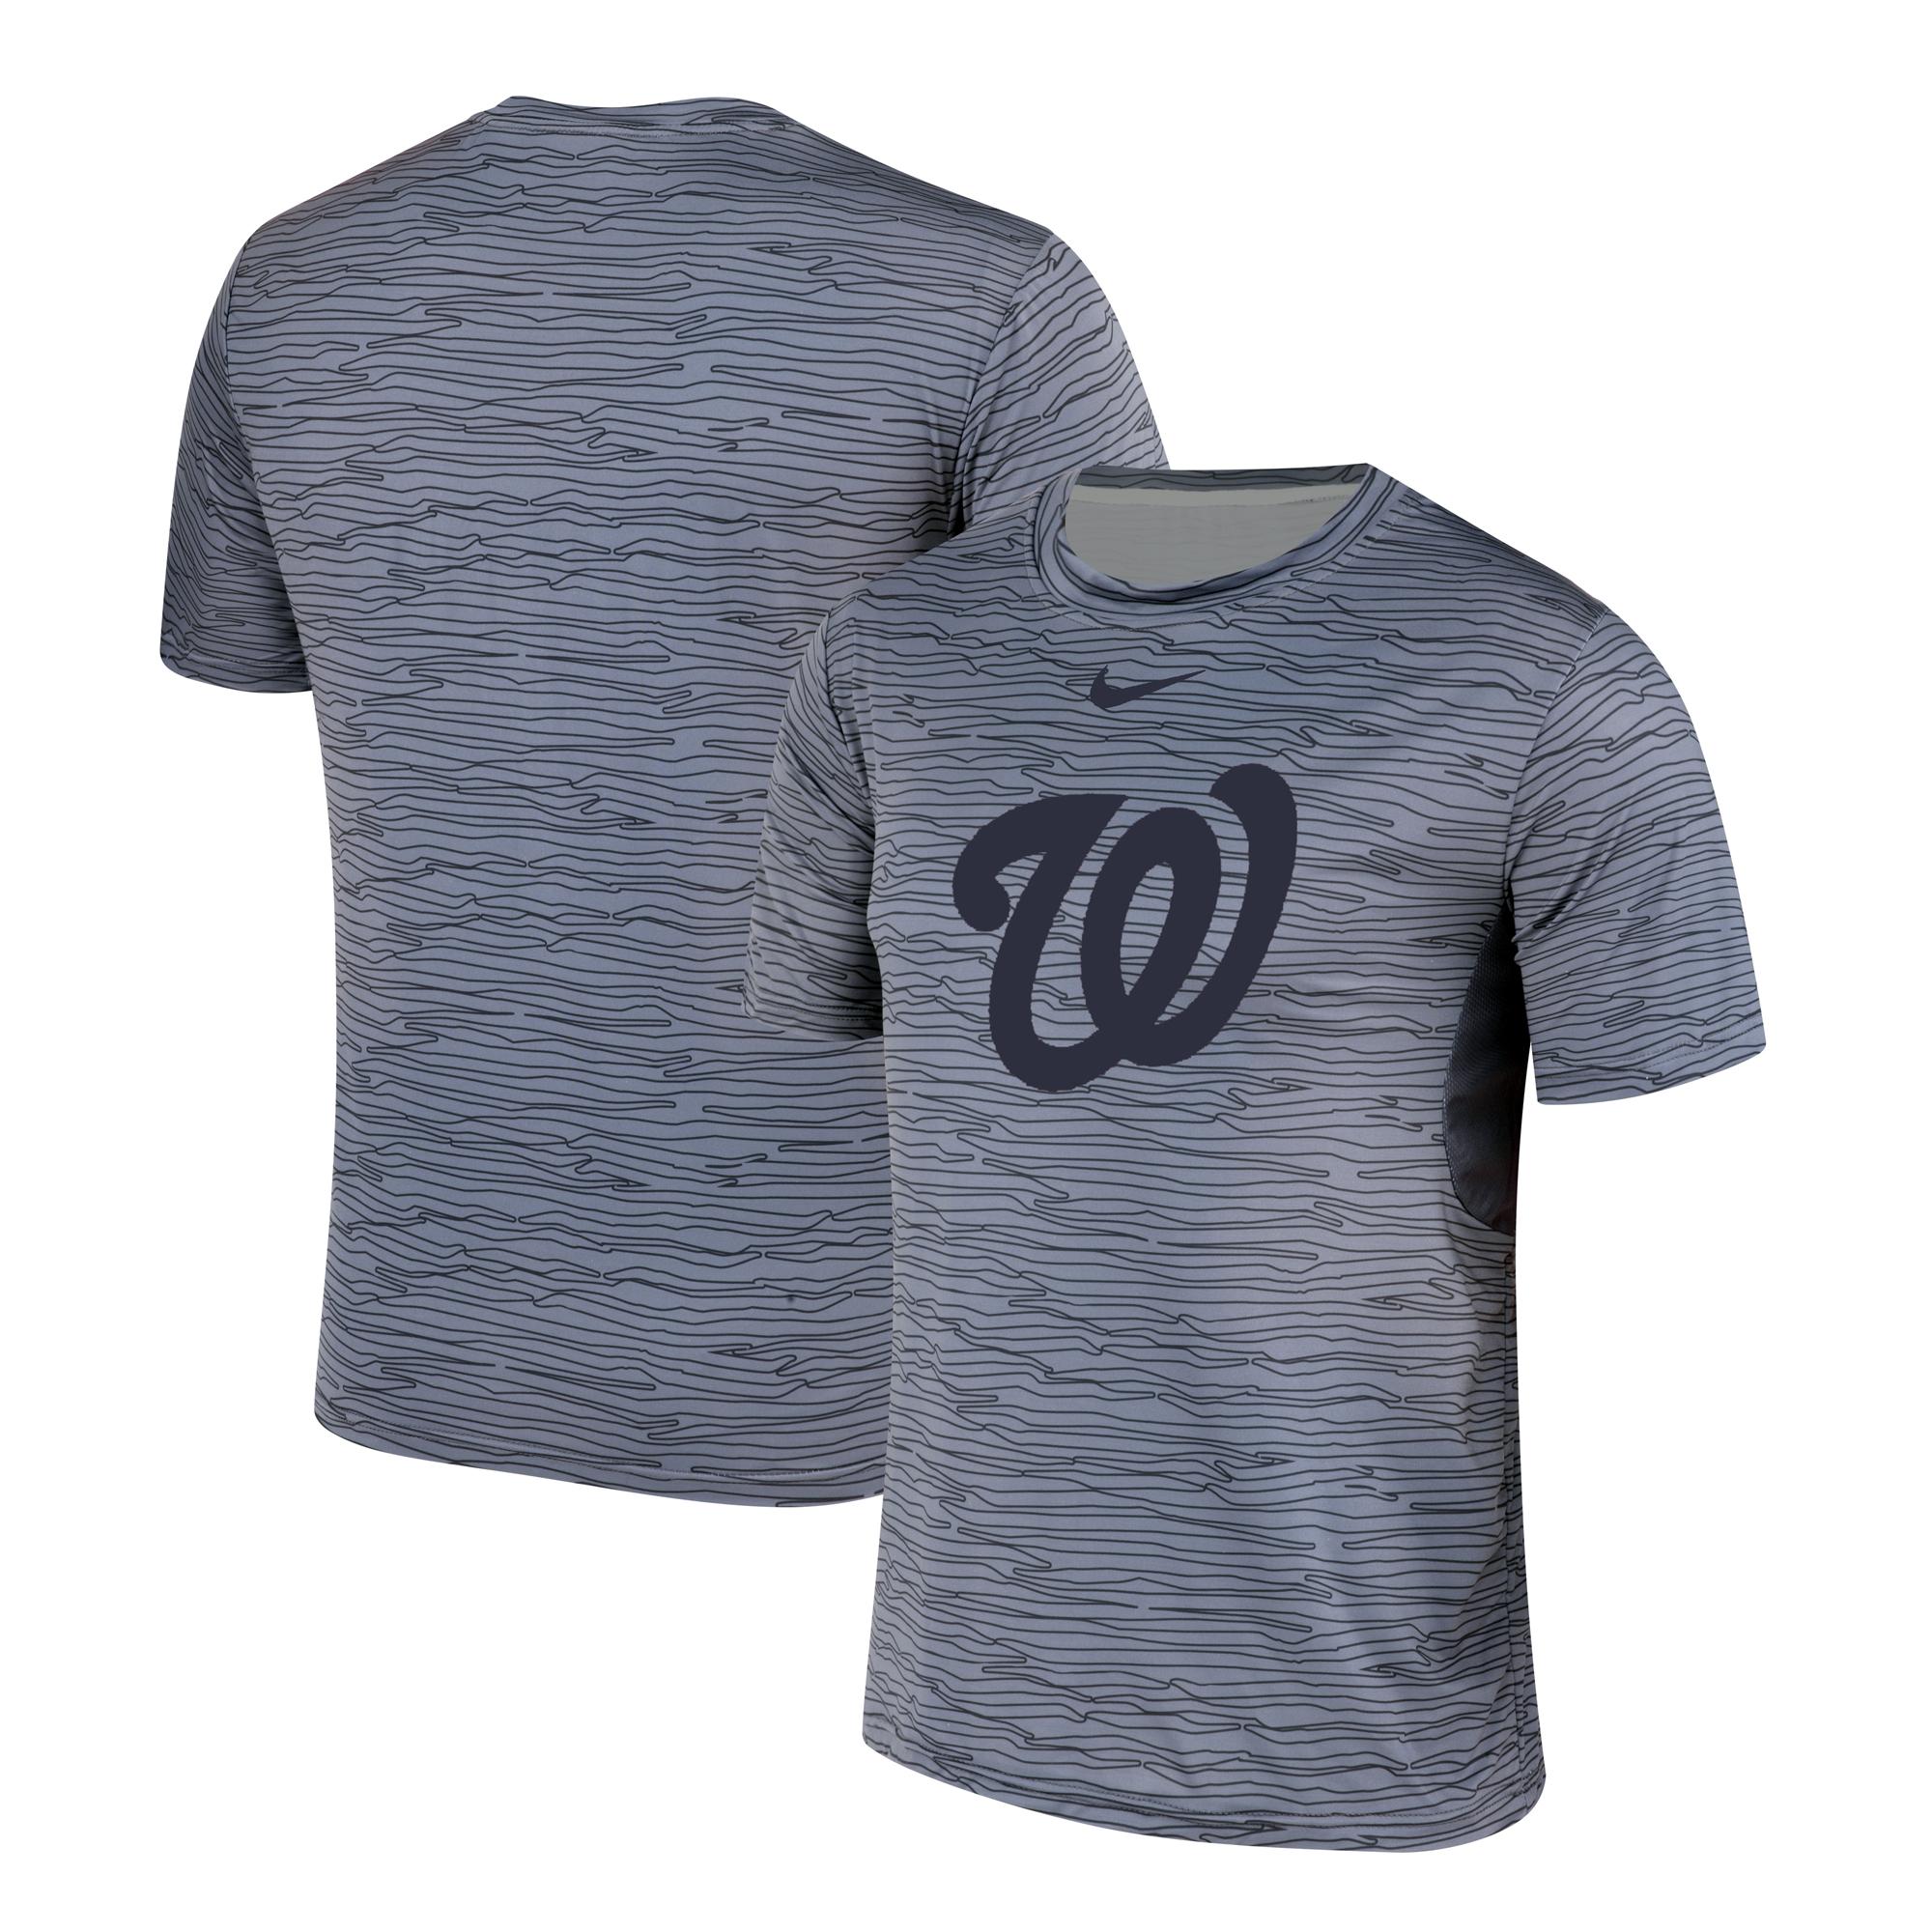 Nike Washington Nationals Gray Black Striped Logo Performance T-Shirt